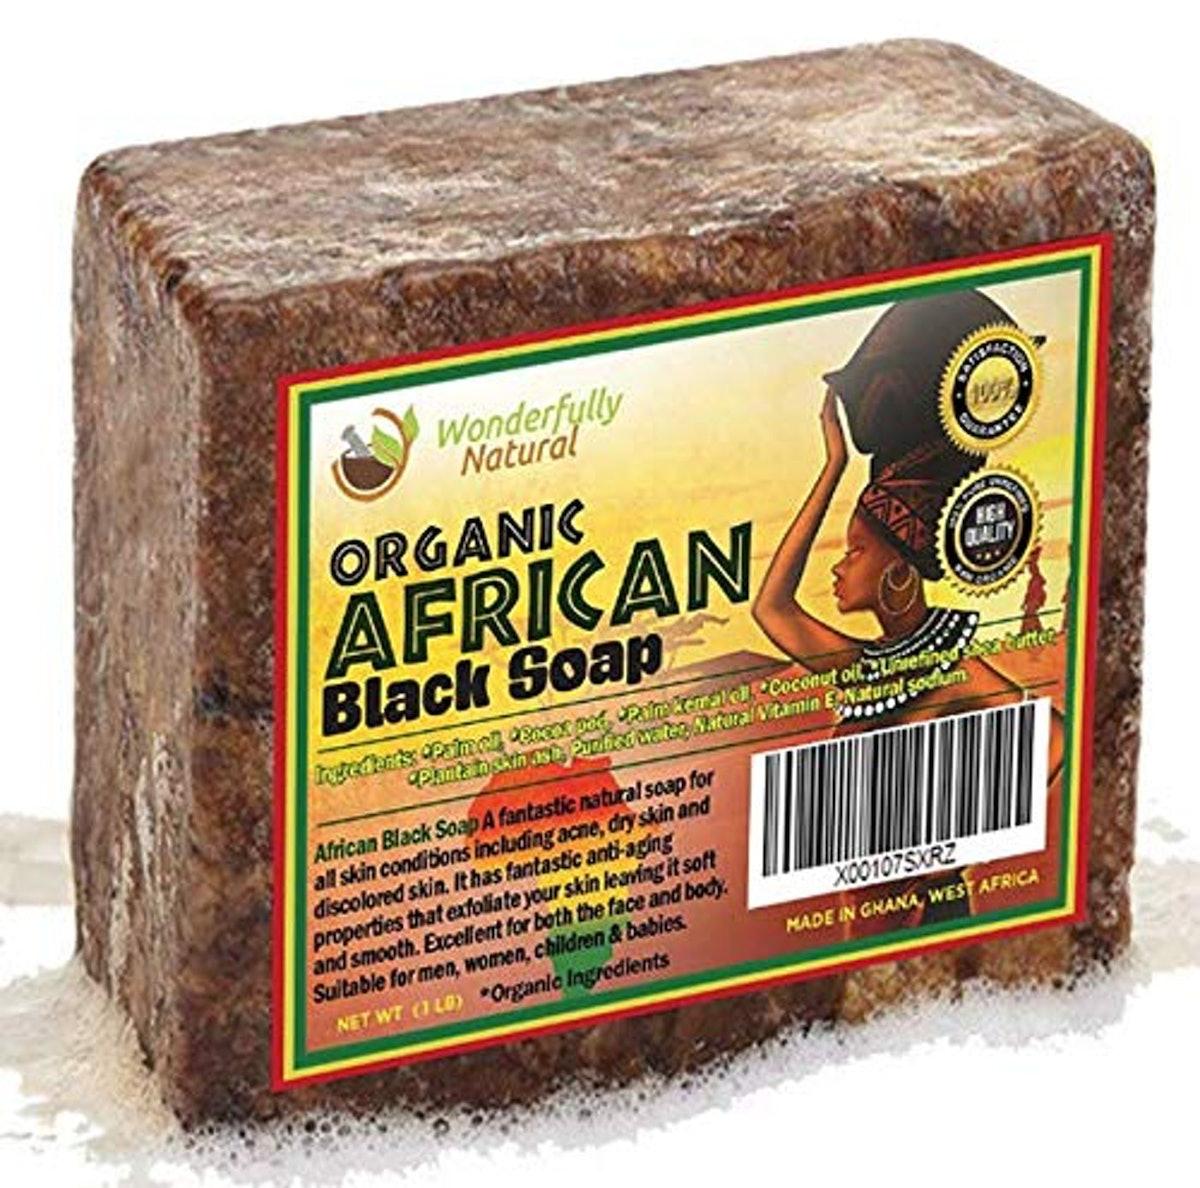 Wonderfully Natural African Black Soap